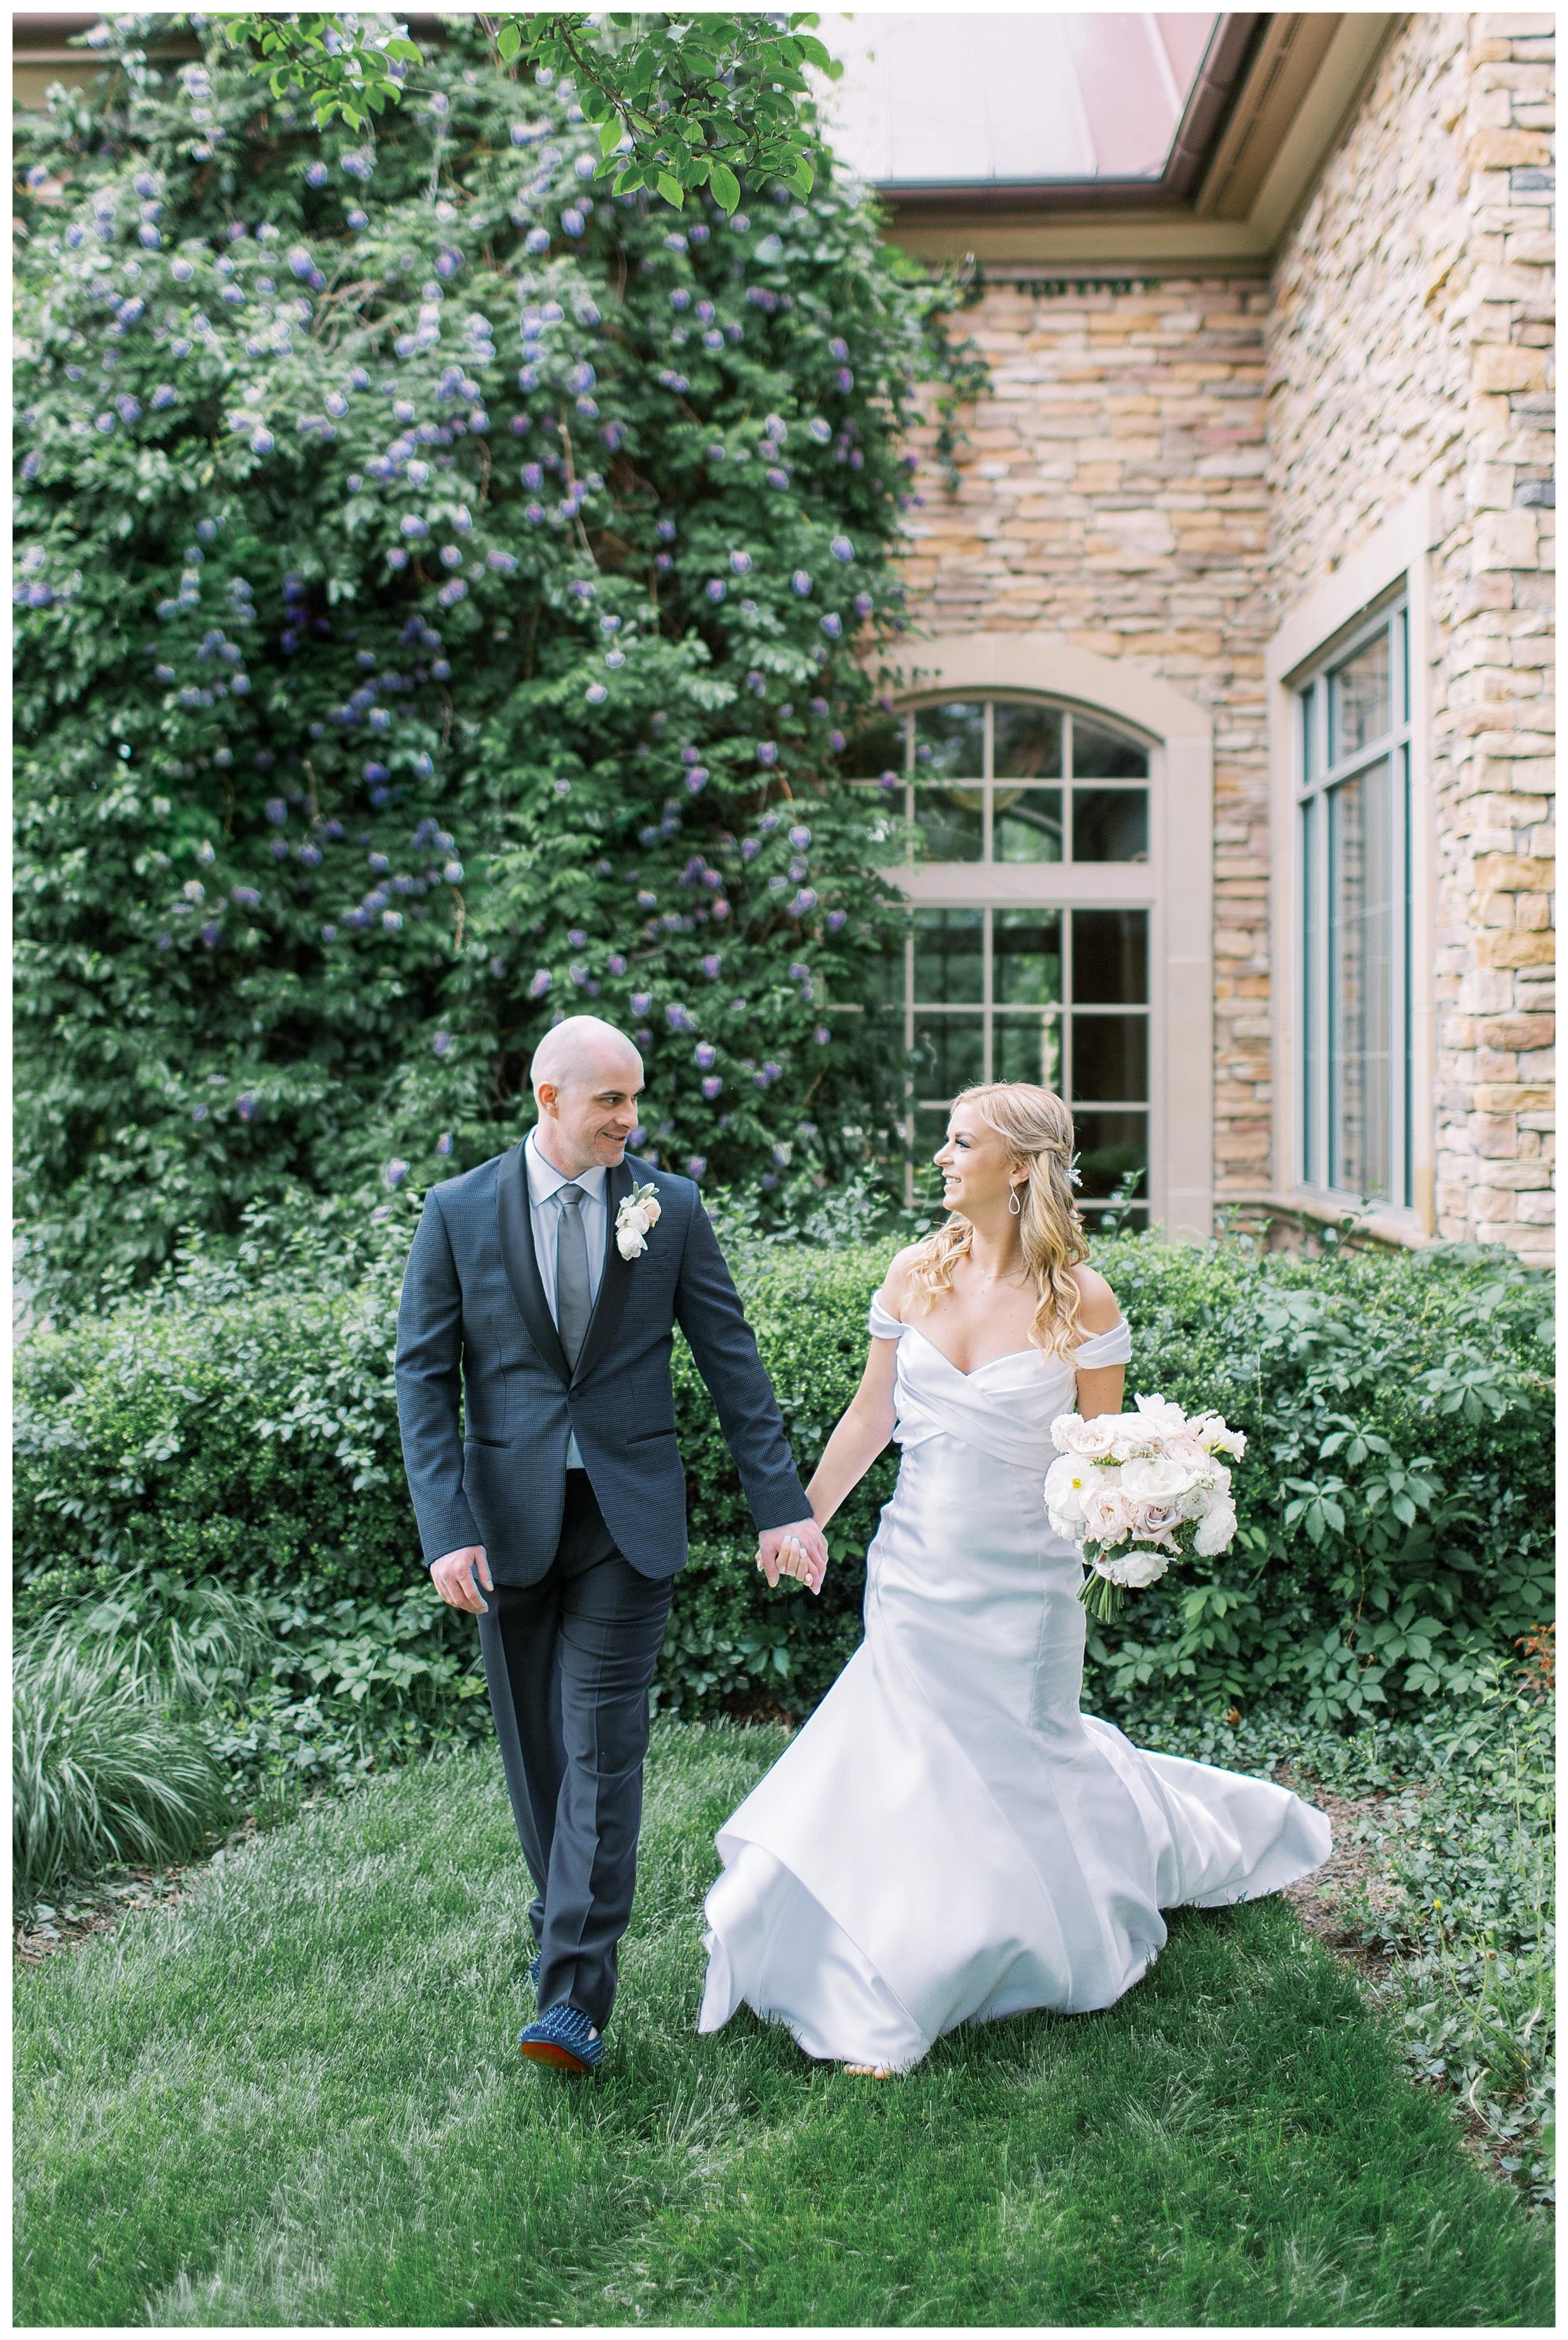 Lansdowne Resort Wedding | Virginia Film Wedding Photographer Kir Tuben_0047.jpg